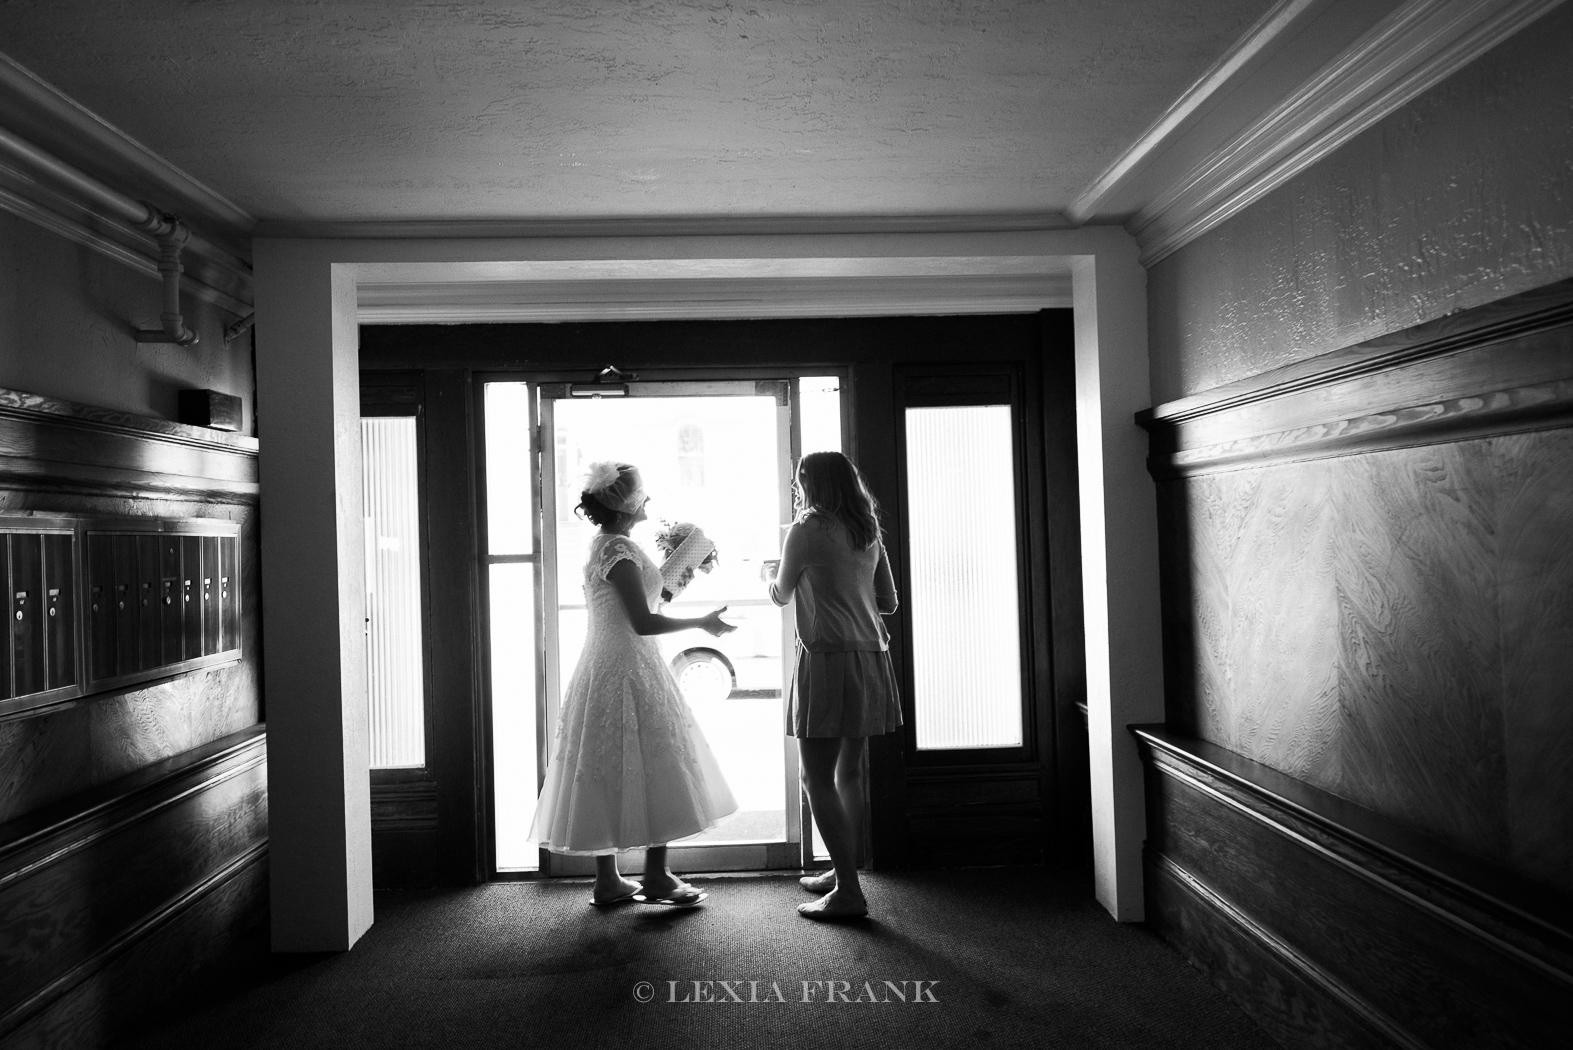 Destination Wedding Photographer Lexia Frank - a portland fine art film photographer - documents this San Francisco City Hall wedding in san francisco as bride heads to the courthouse. www.lexiafrank.com